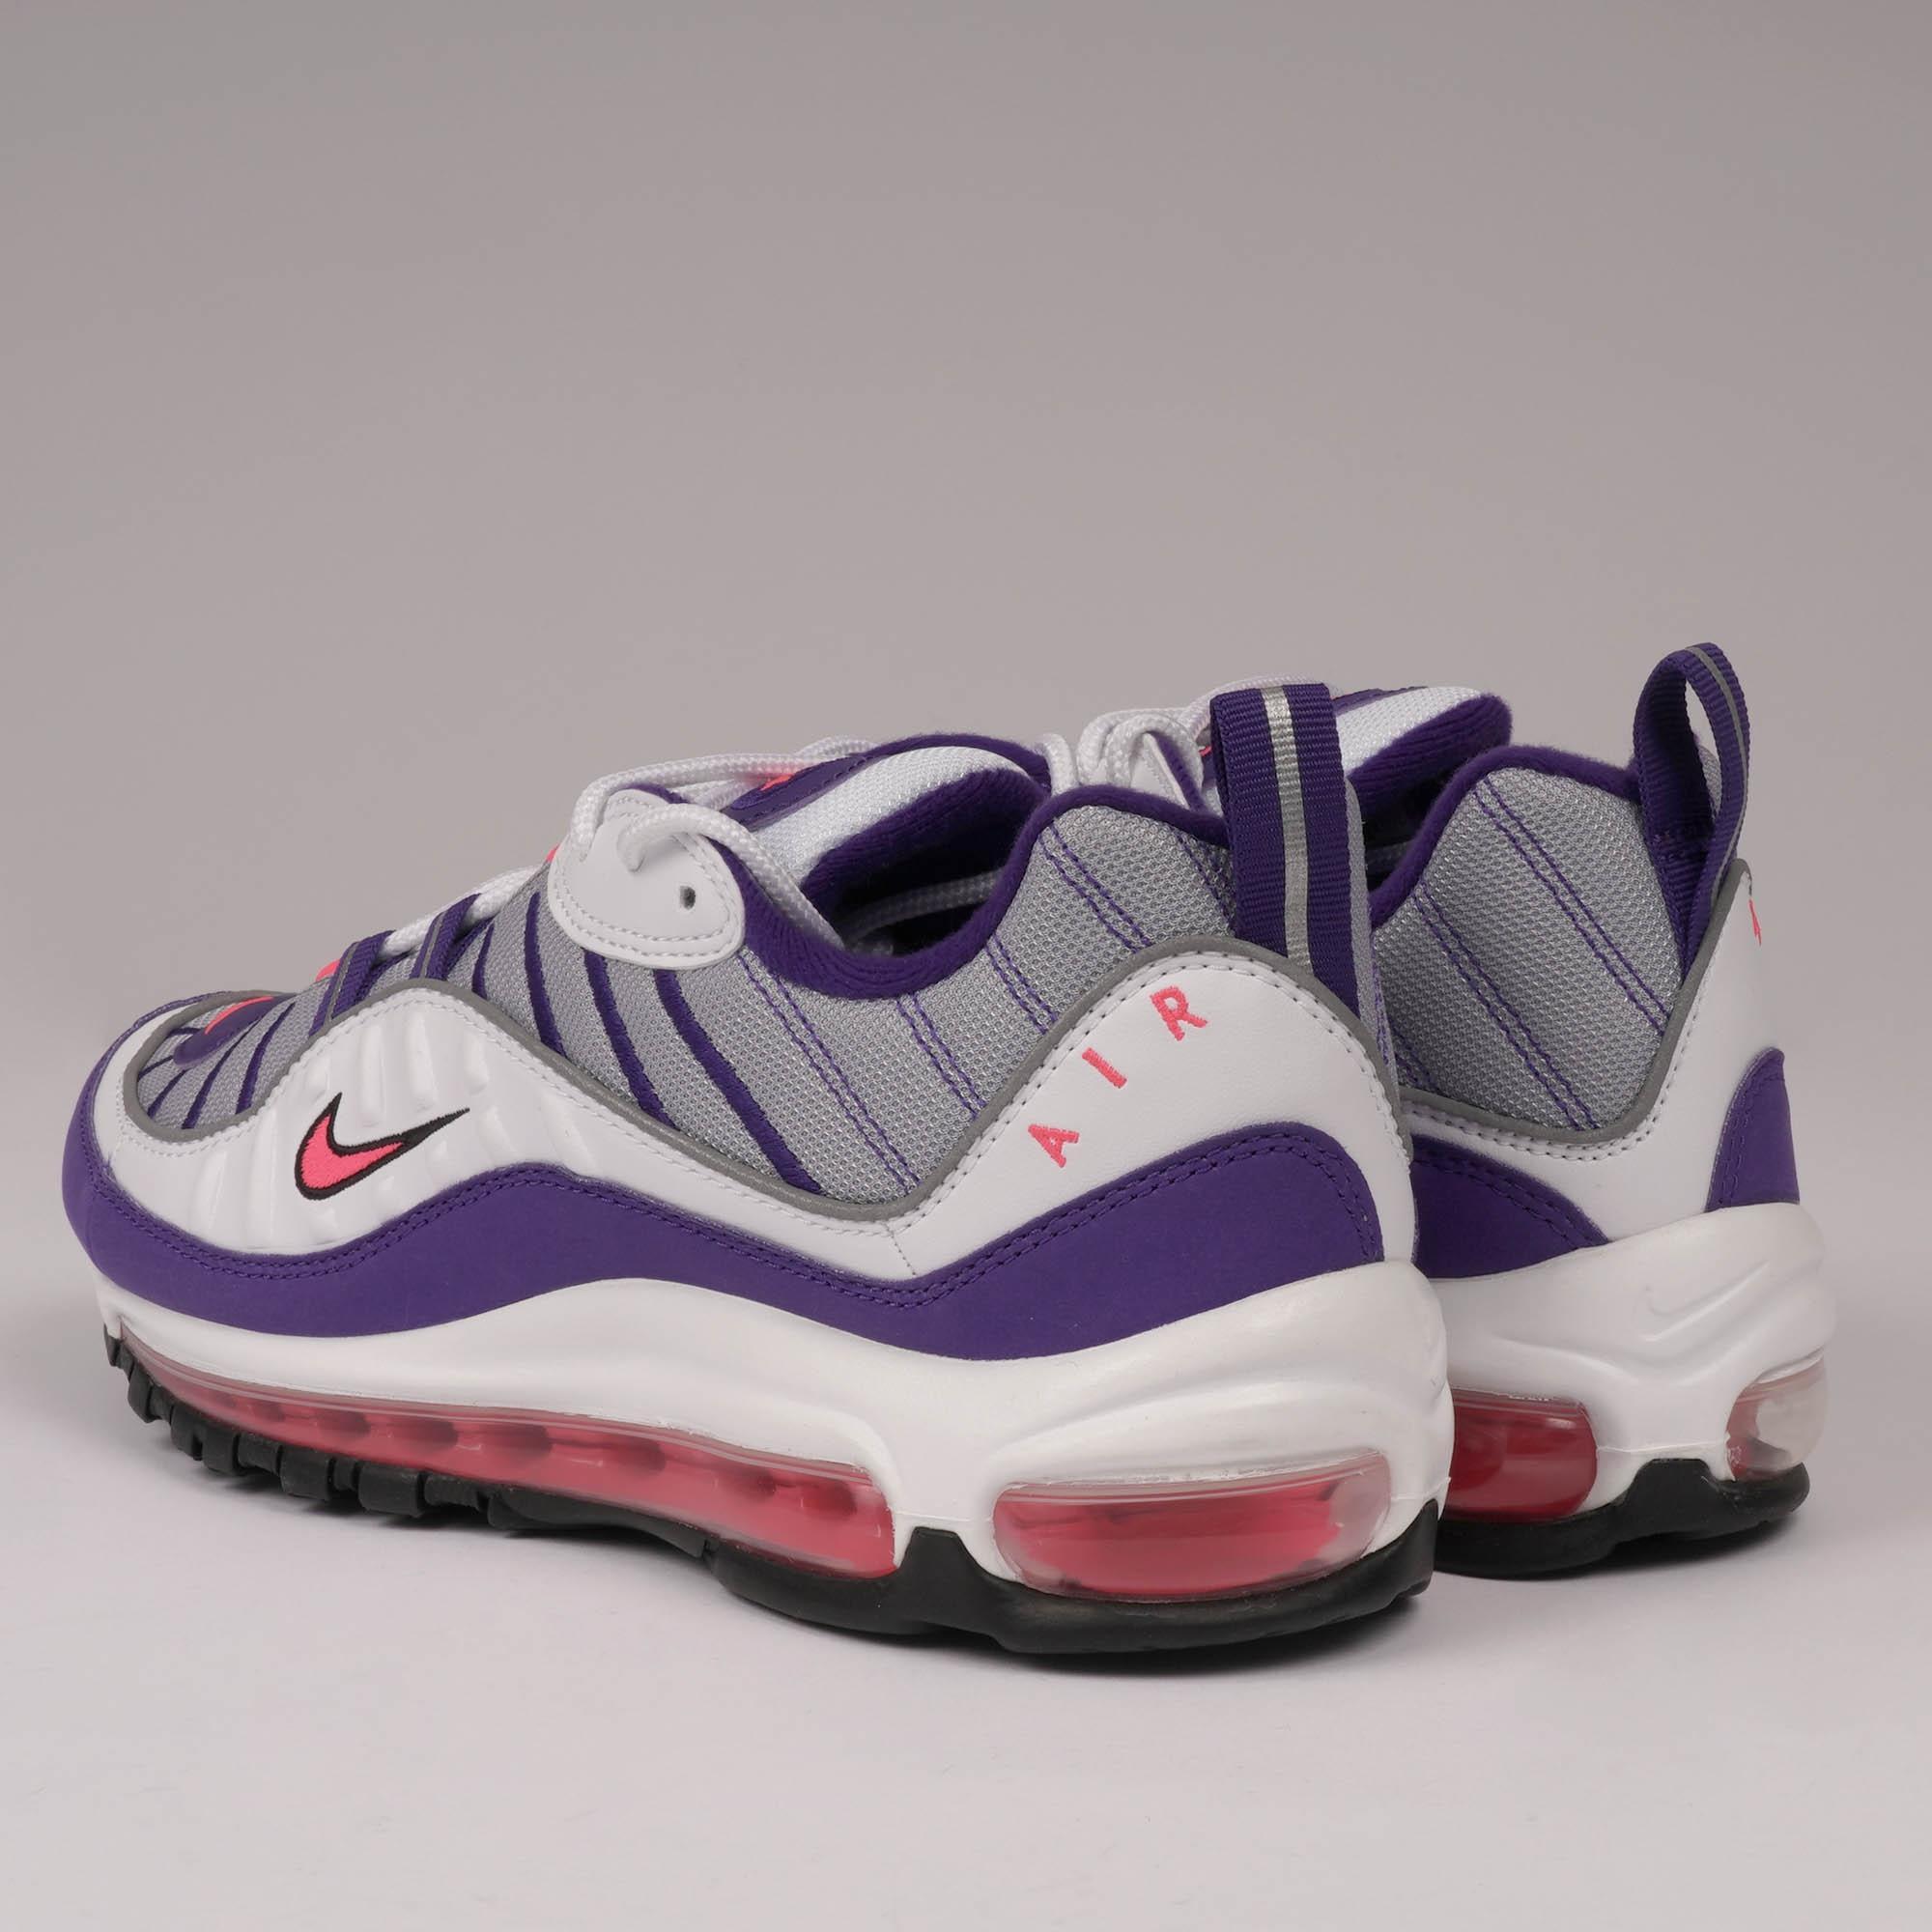 best service e9956 d4b18 Nike - Air Max 98 - White  Racer Pink for Men - Lyst. View fullscreen